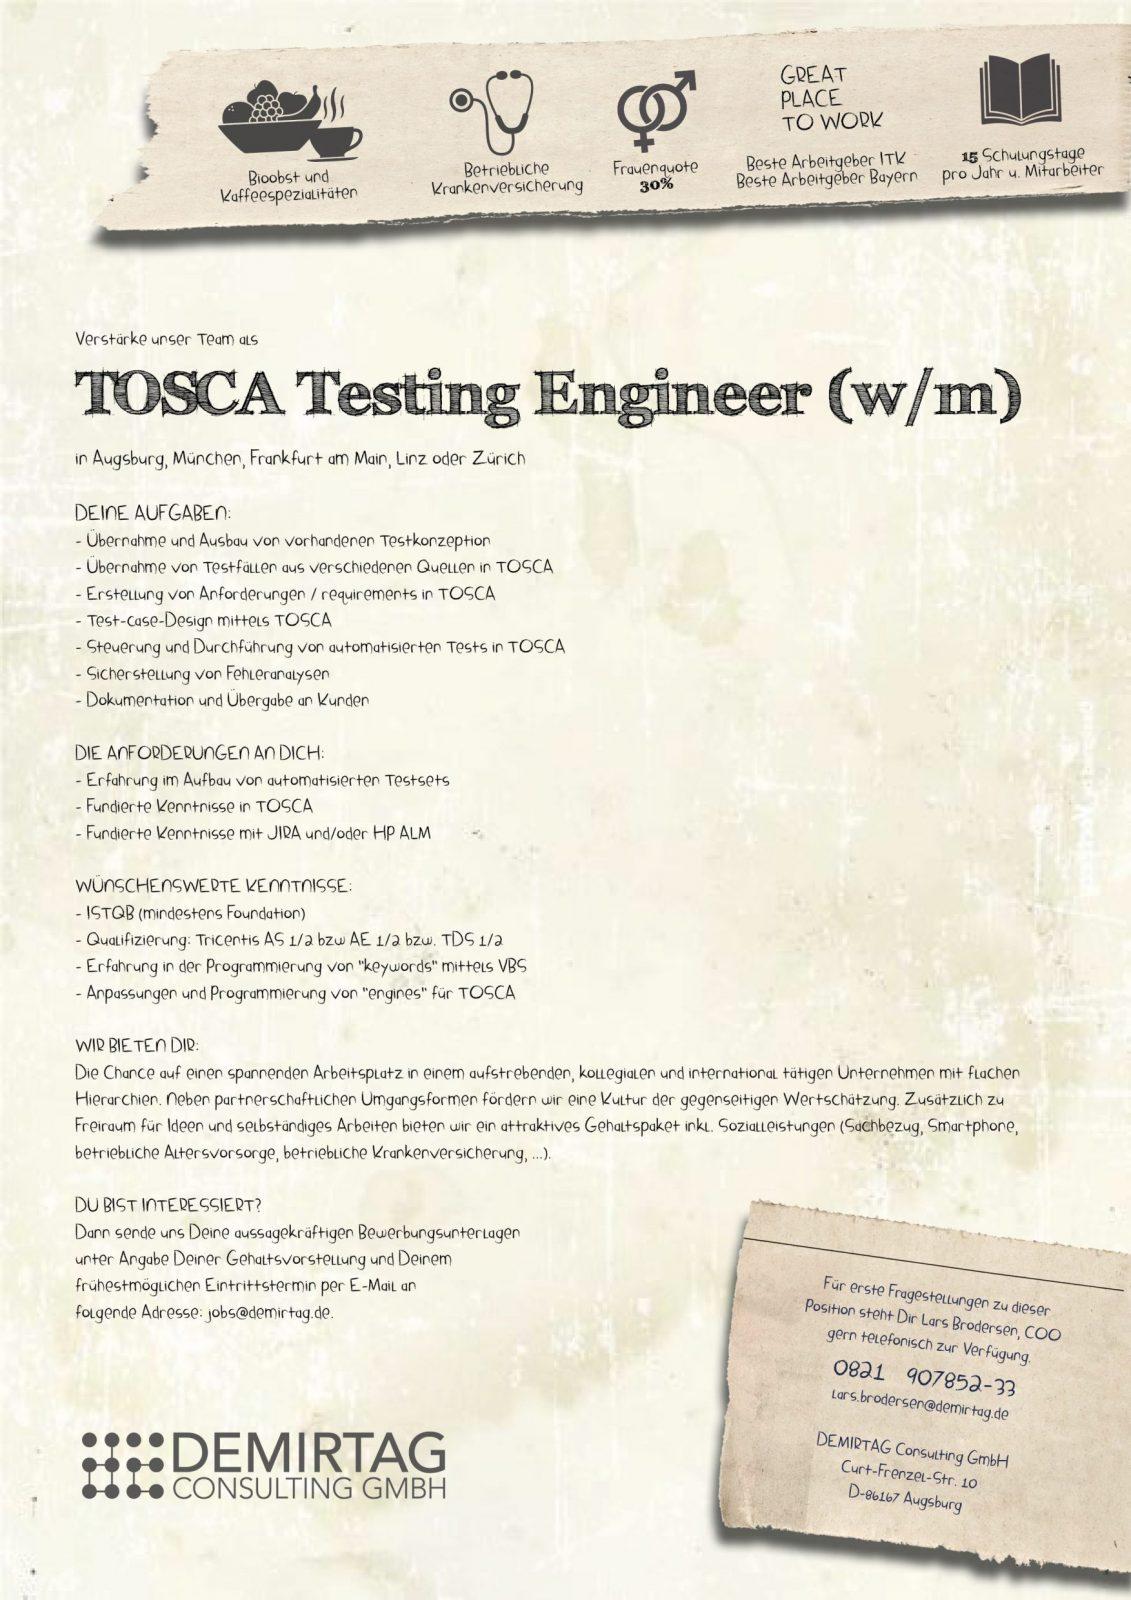 Tosca Testing Engineer Demirtag